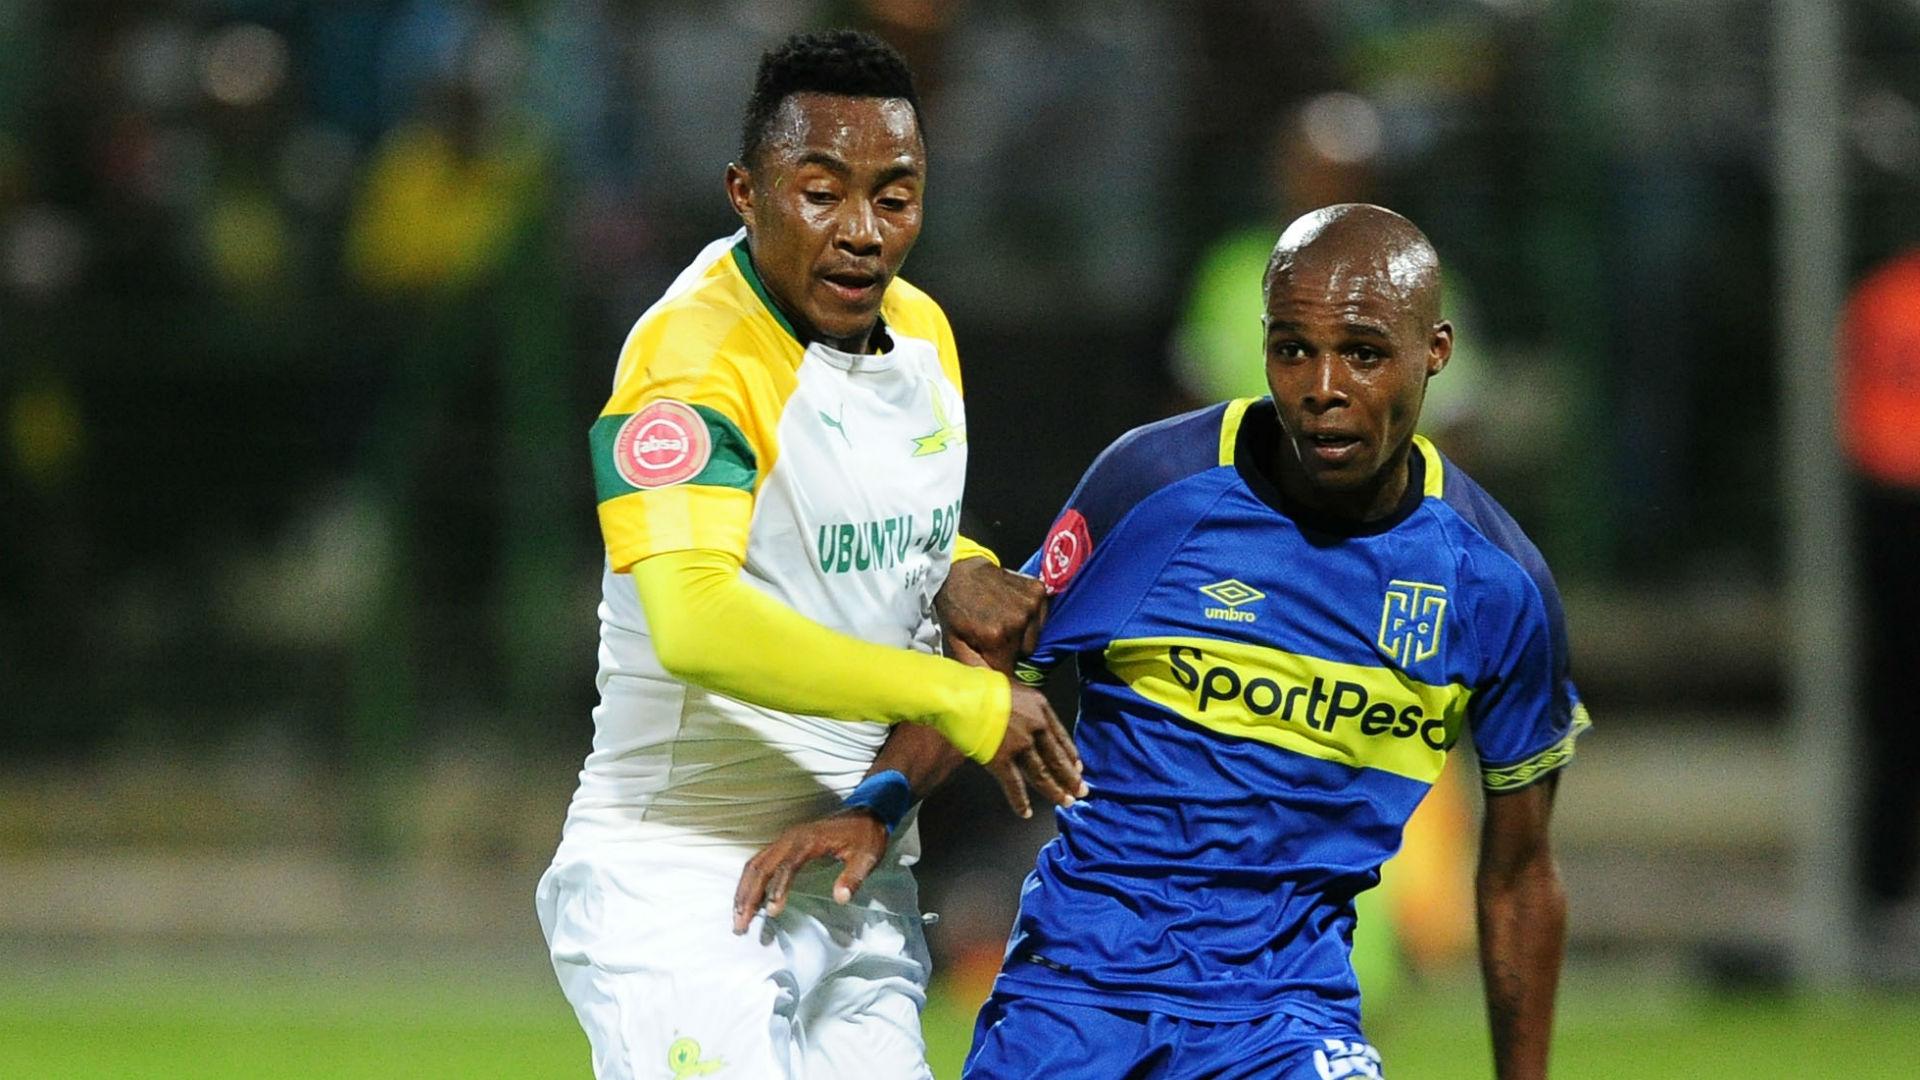 Mamelodi Sundowns vs. Cape Town City: Five players to watch